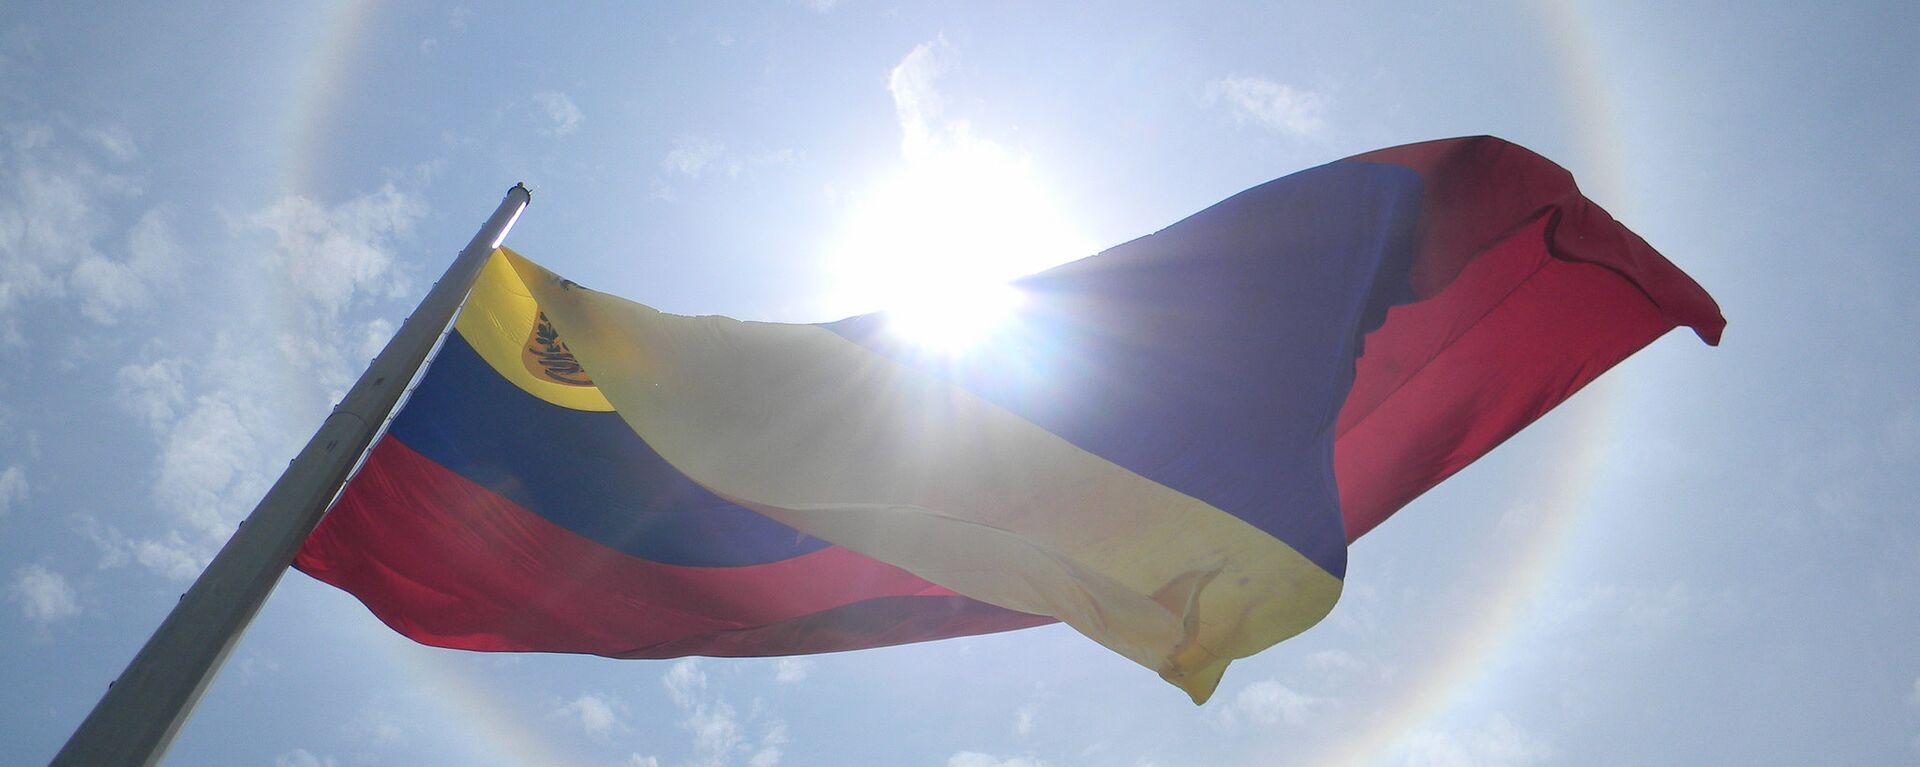 Bandera de Venezuela - Sputnik Mundo, 1920, 12.01.2021